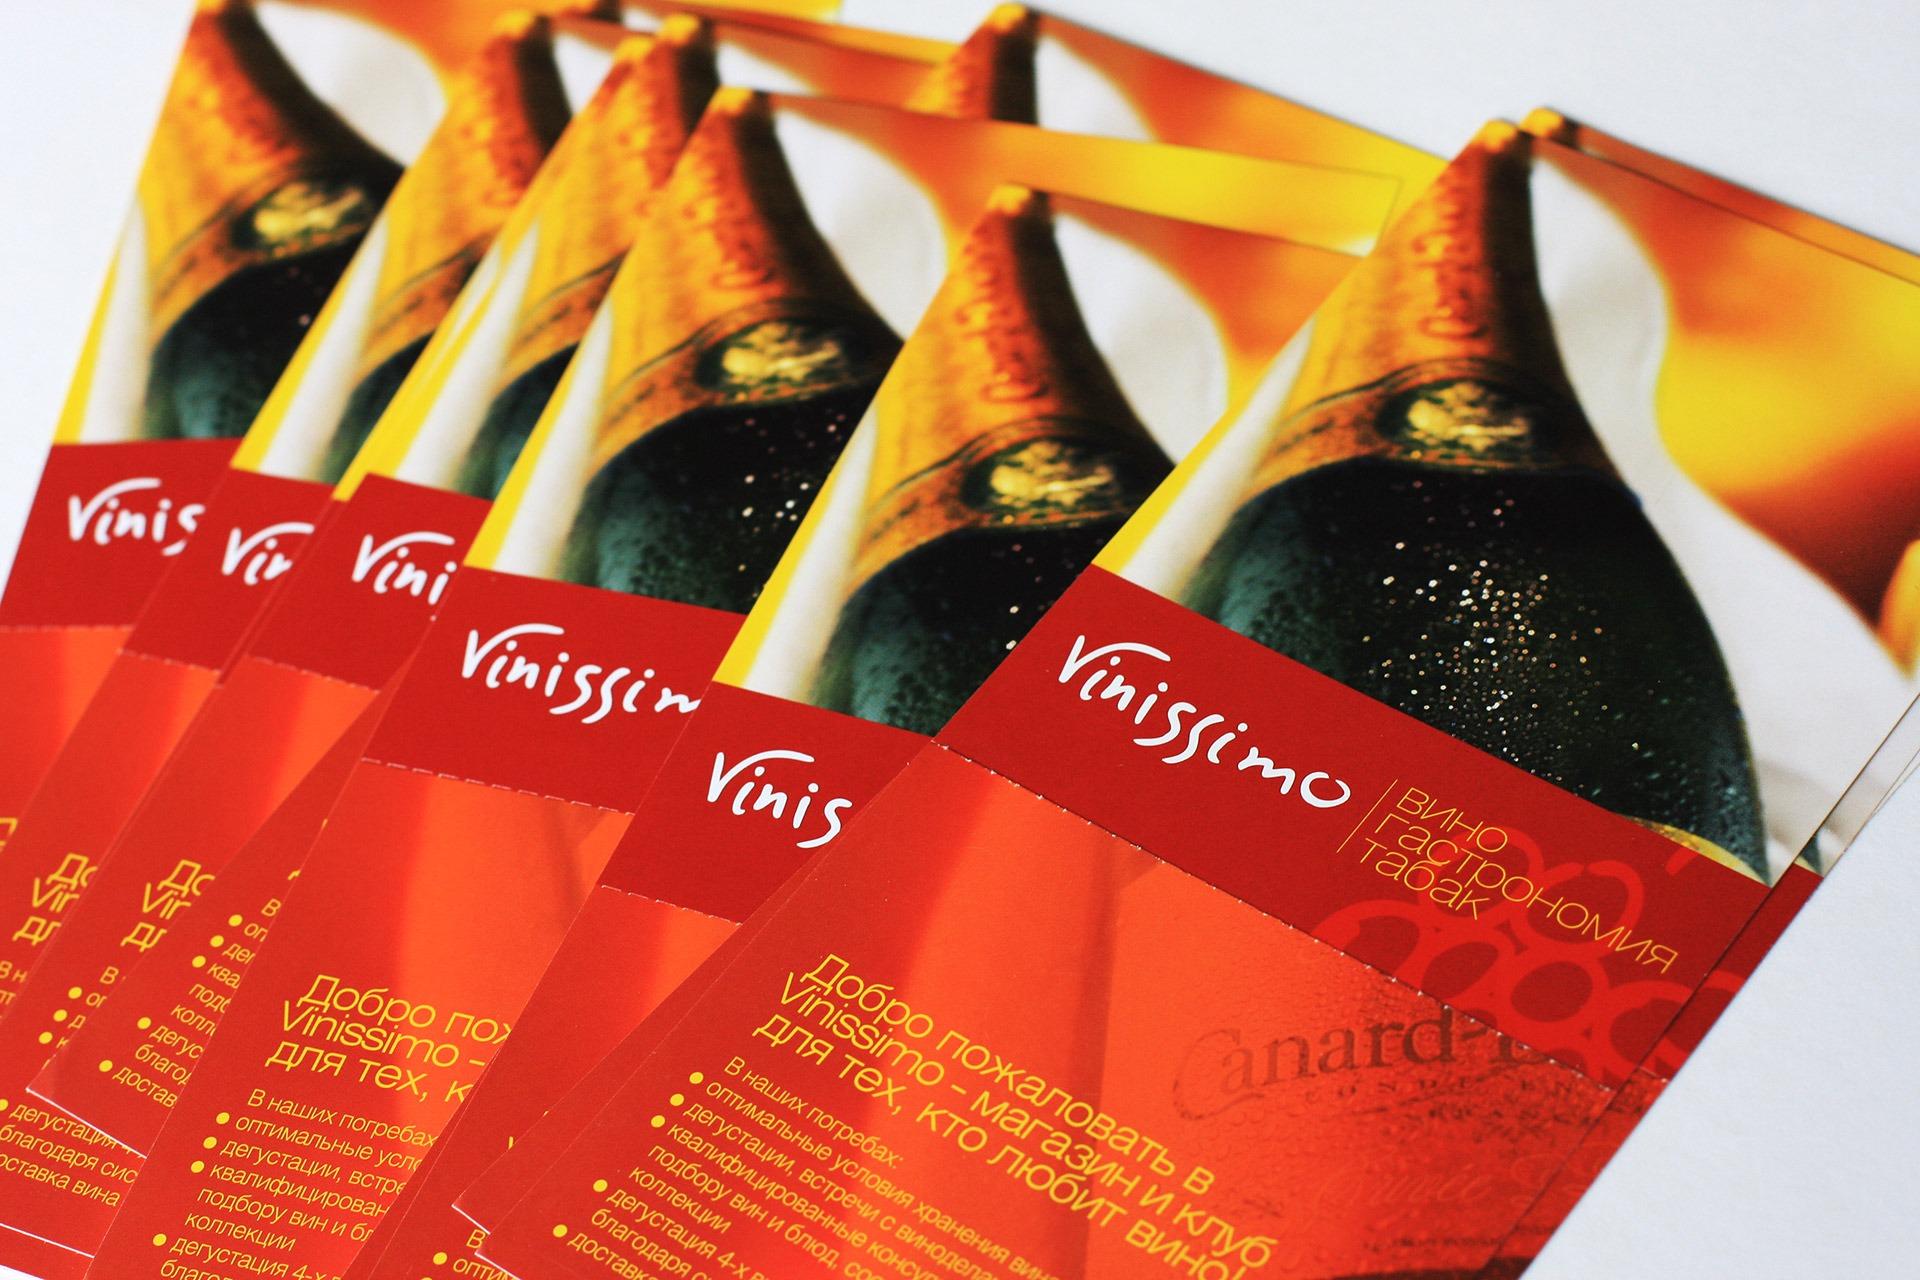 Asgard Branding, corporate identity, branding, wine, logo, design, booklet design